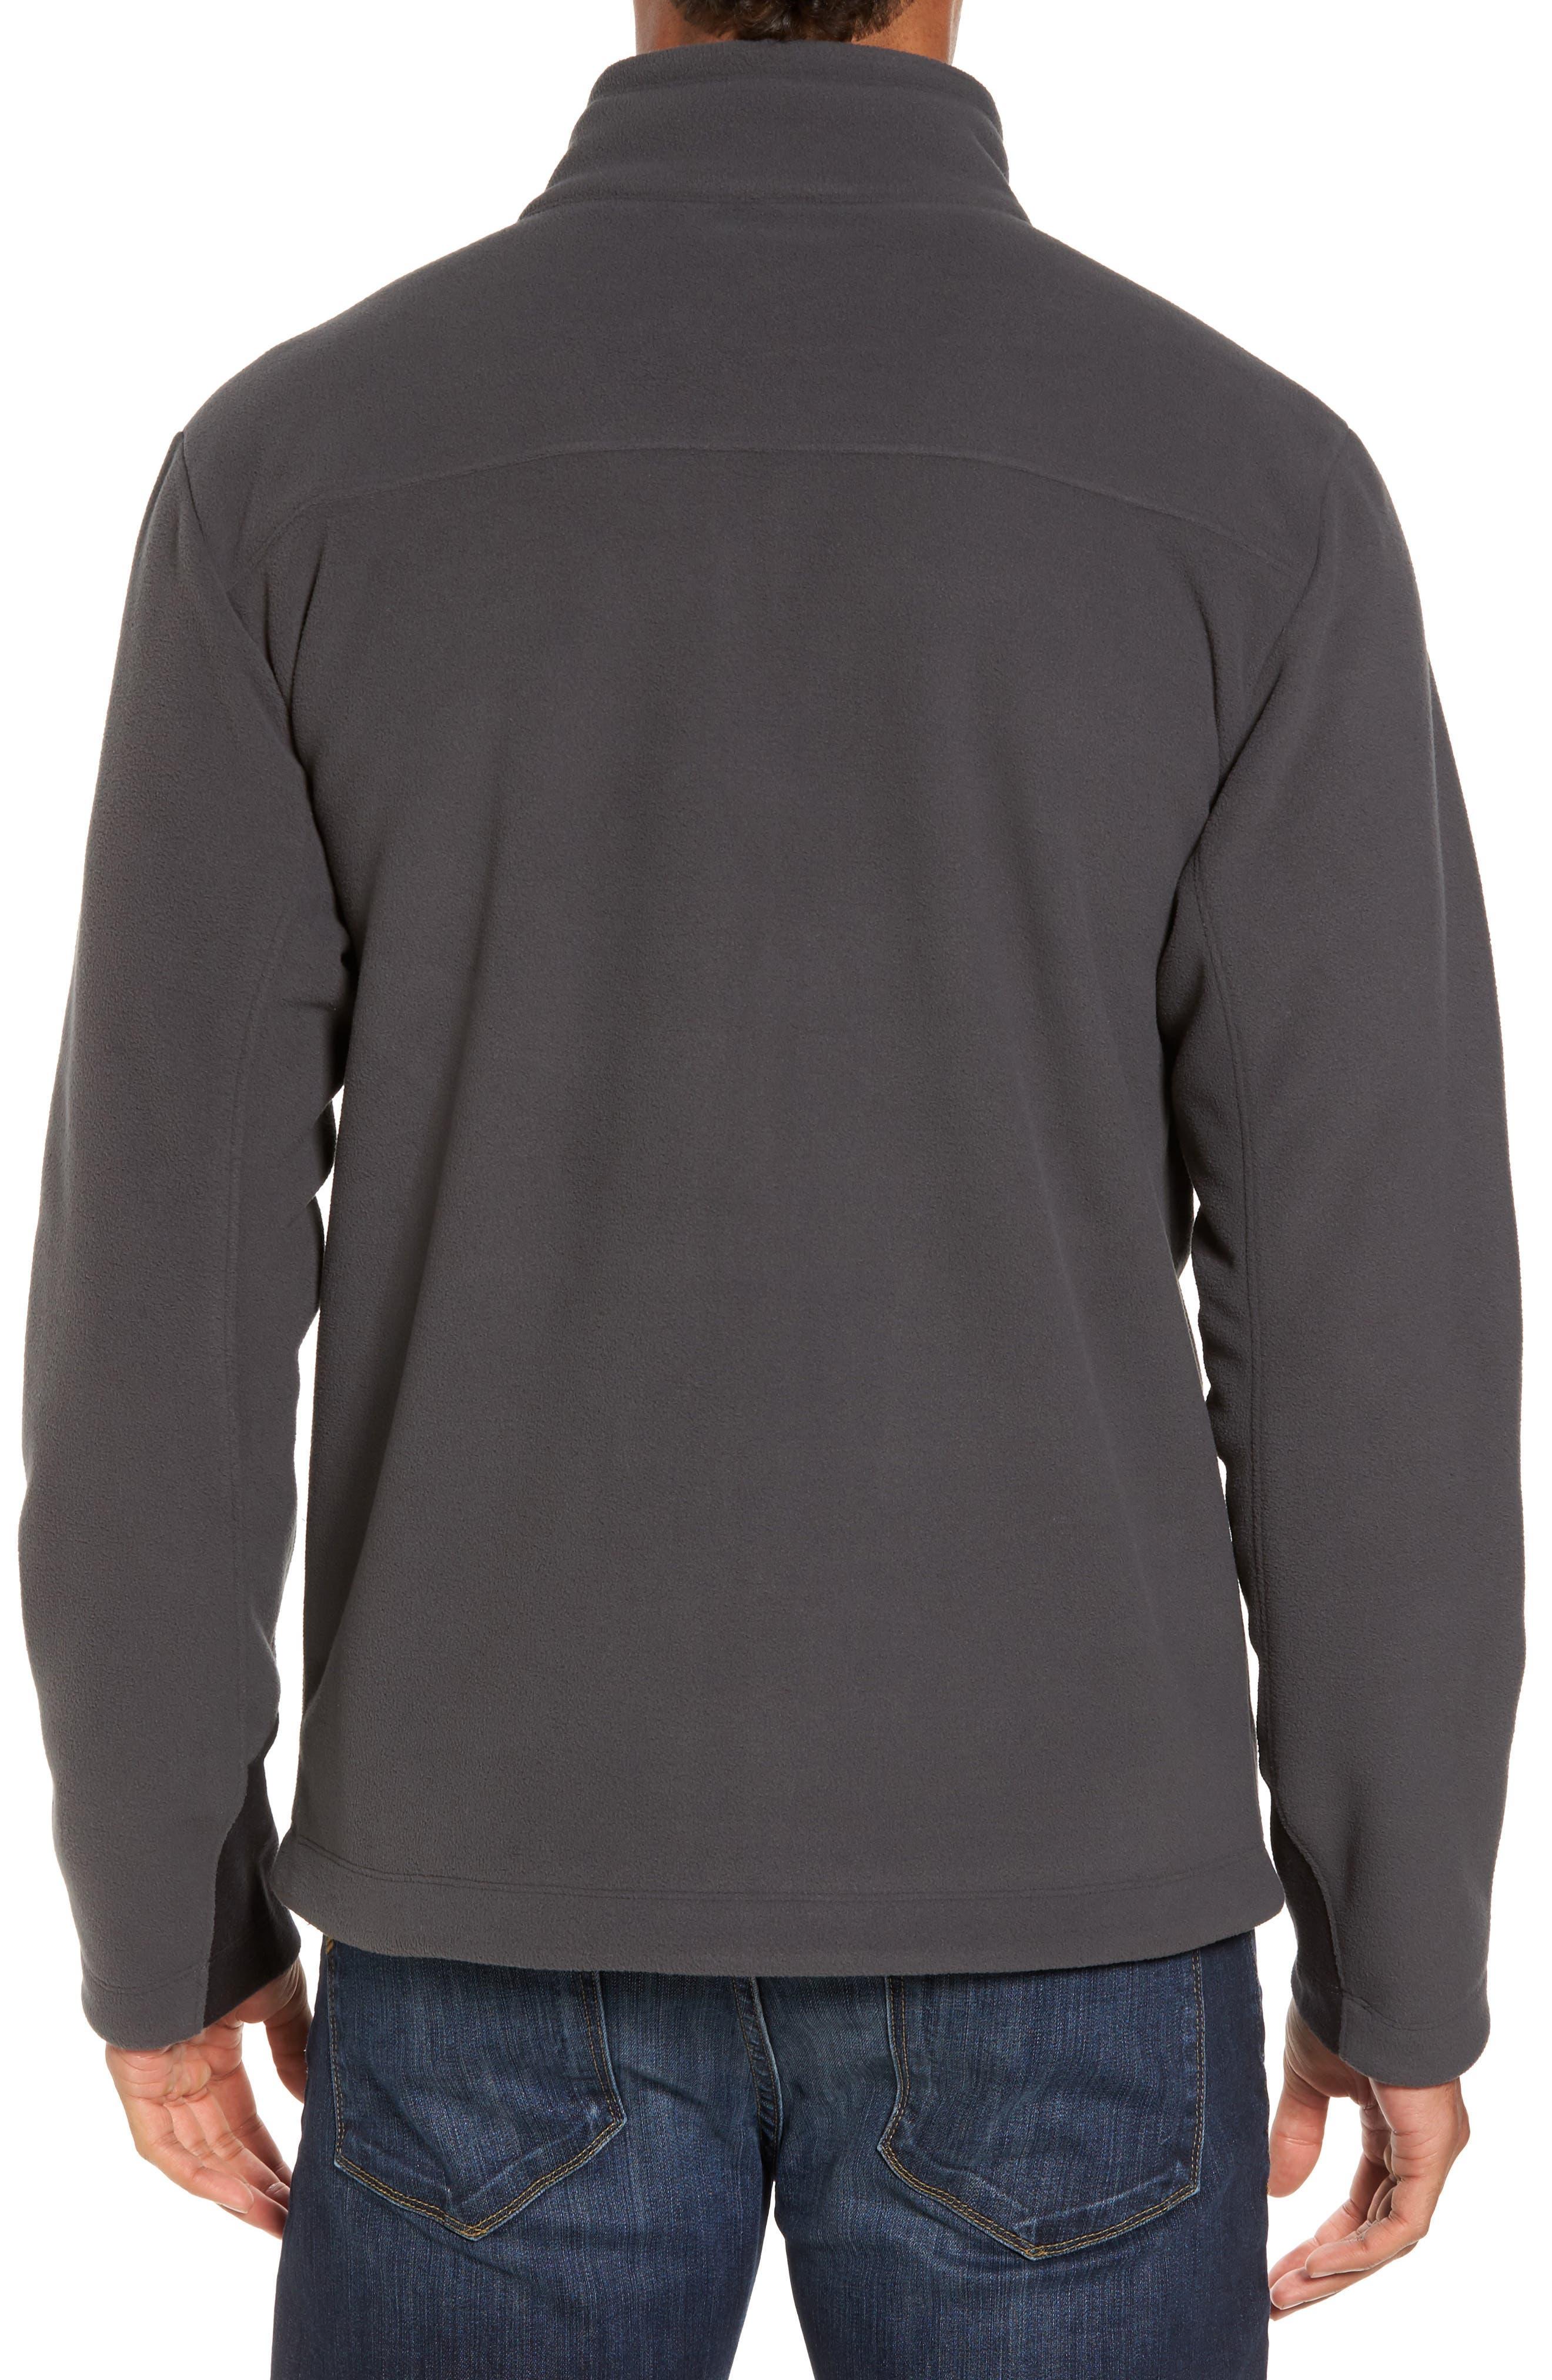 'Chimborazo' Zip Front Fleece Jacket,                             Alternate thumbnail 18, color,